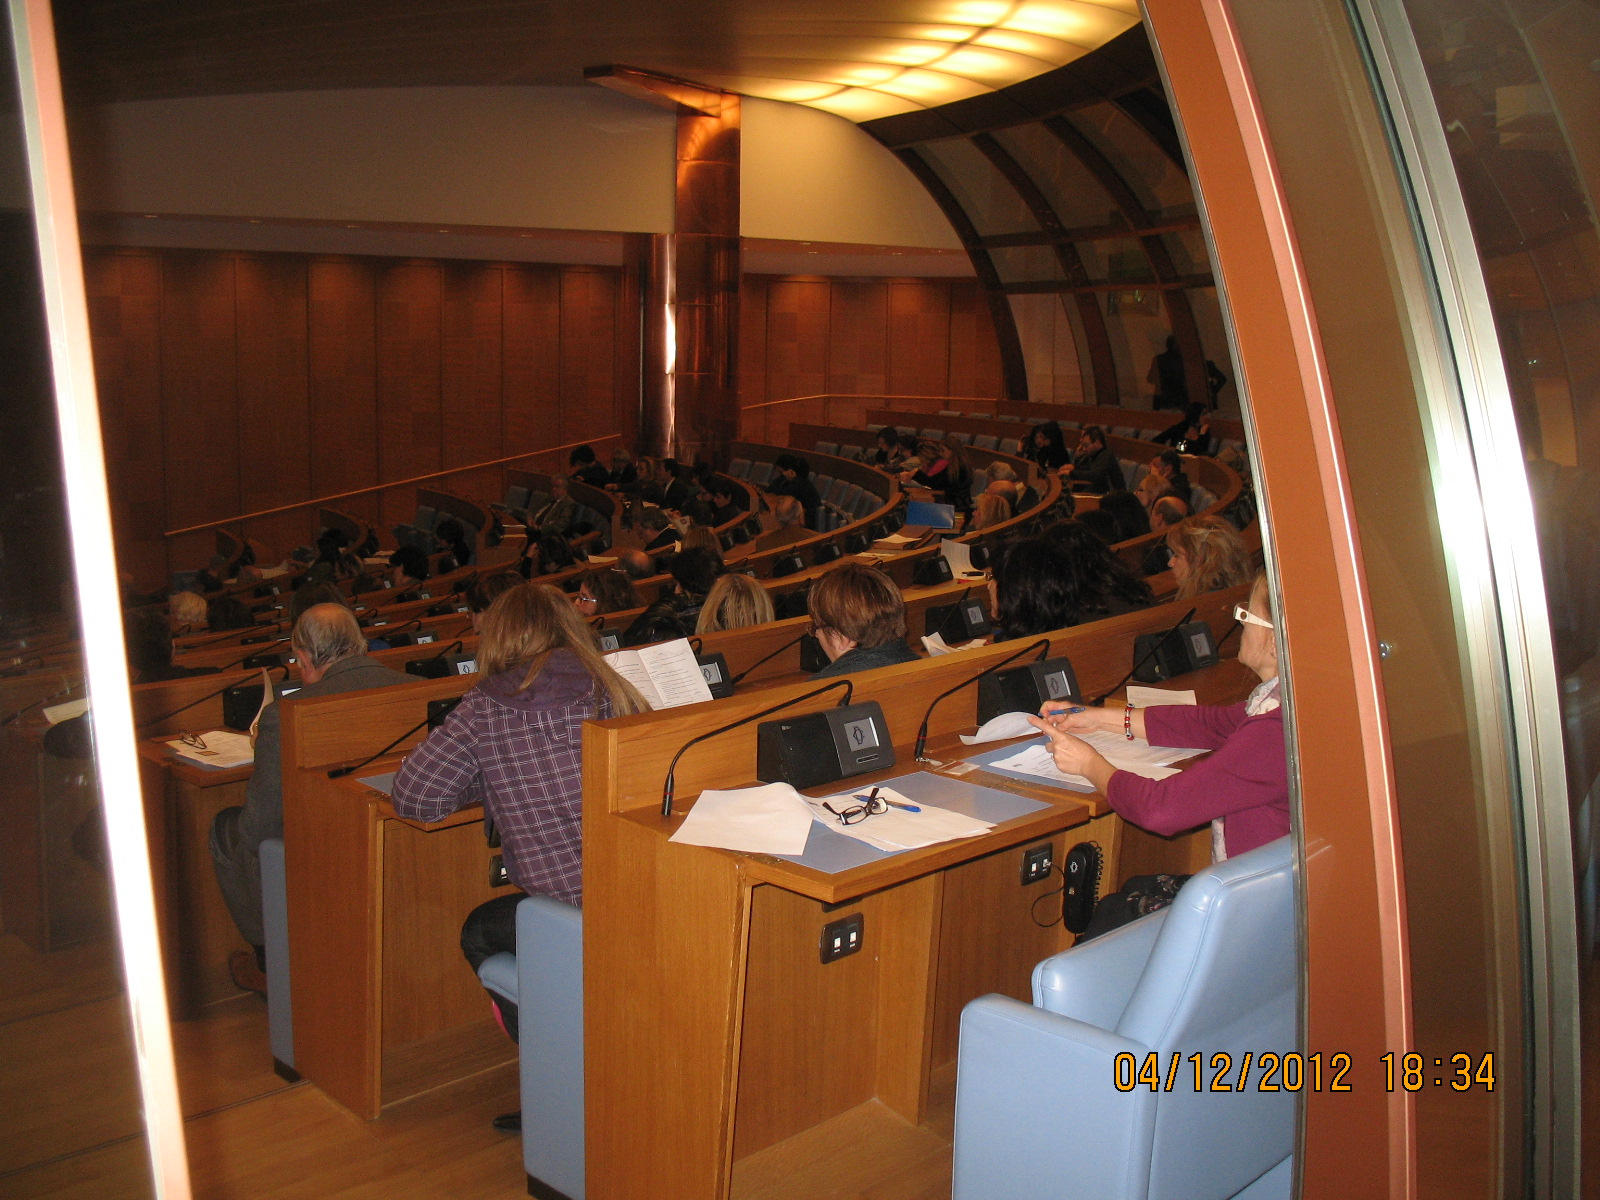 http://associazioneamec.com/amec/images/foto/IMG_6.JPG